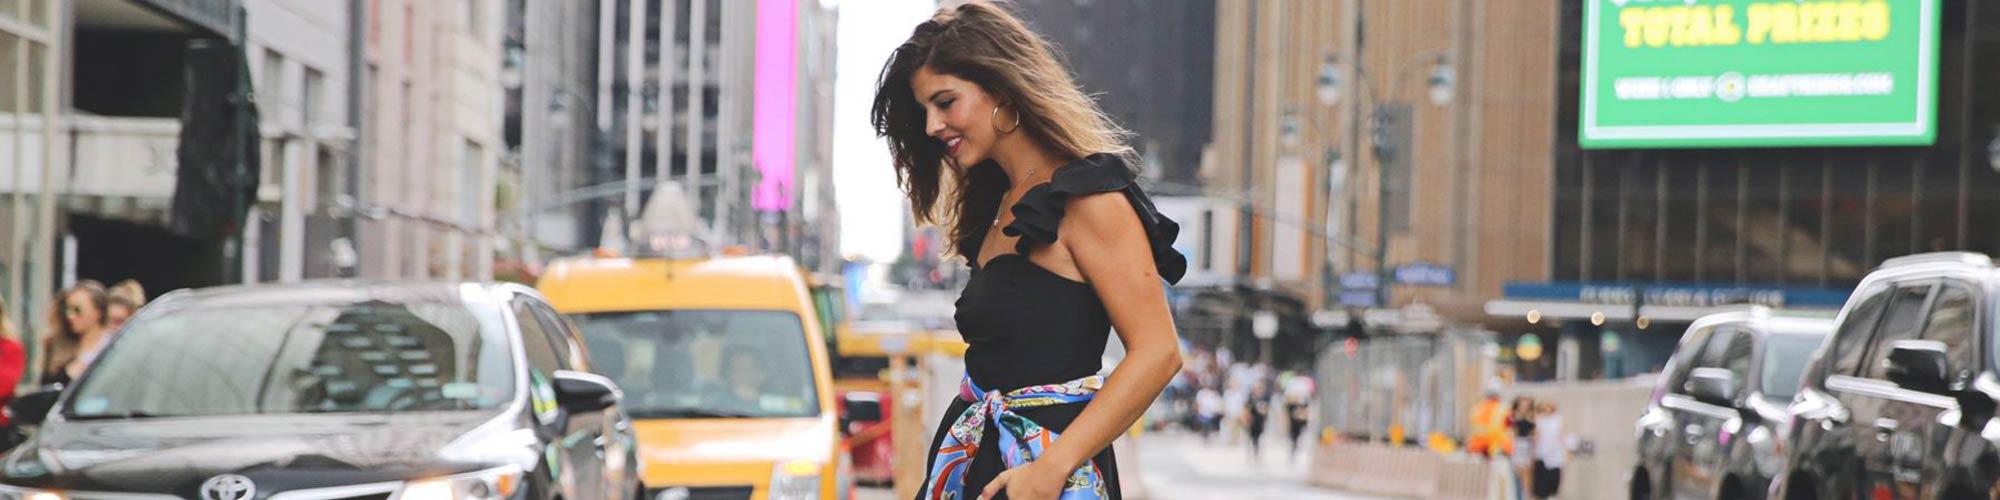 New York Trendy - El Pais Viajes